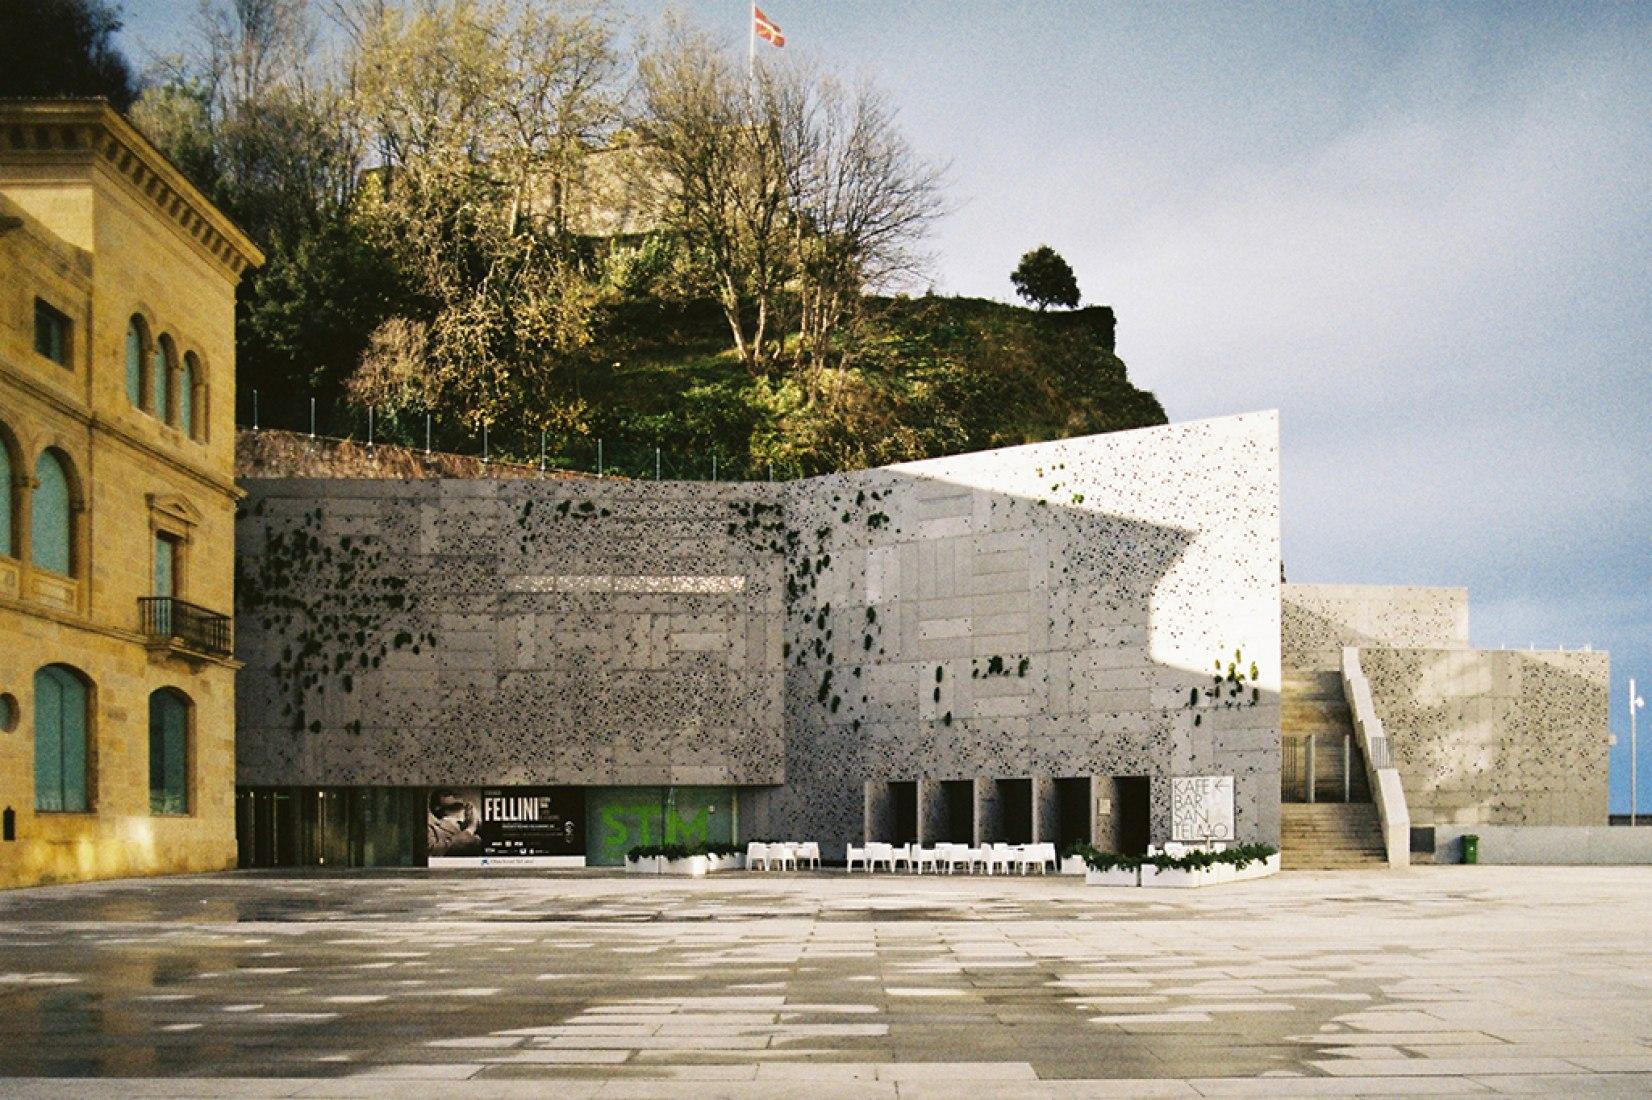 Museo San Telmo en San Sebastián. Nieto Sobejano Arquitectos. Imagen © Klaus Englert. Cortesía de Haus der Architekten NRW.